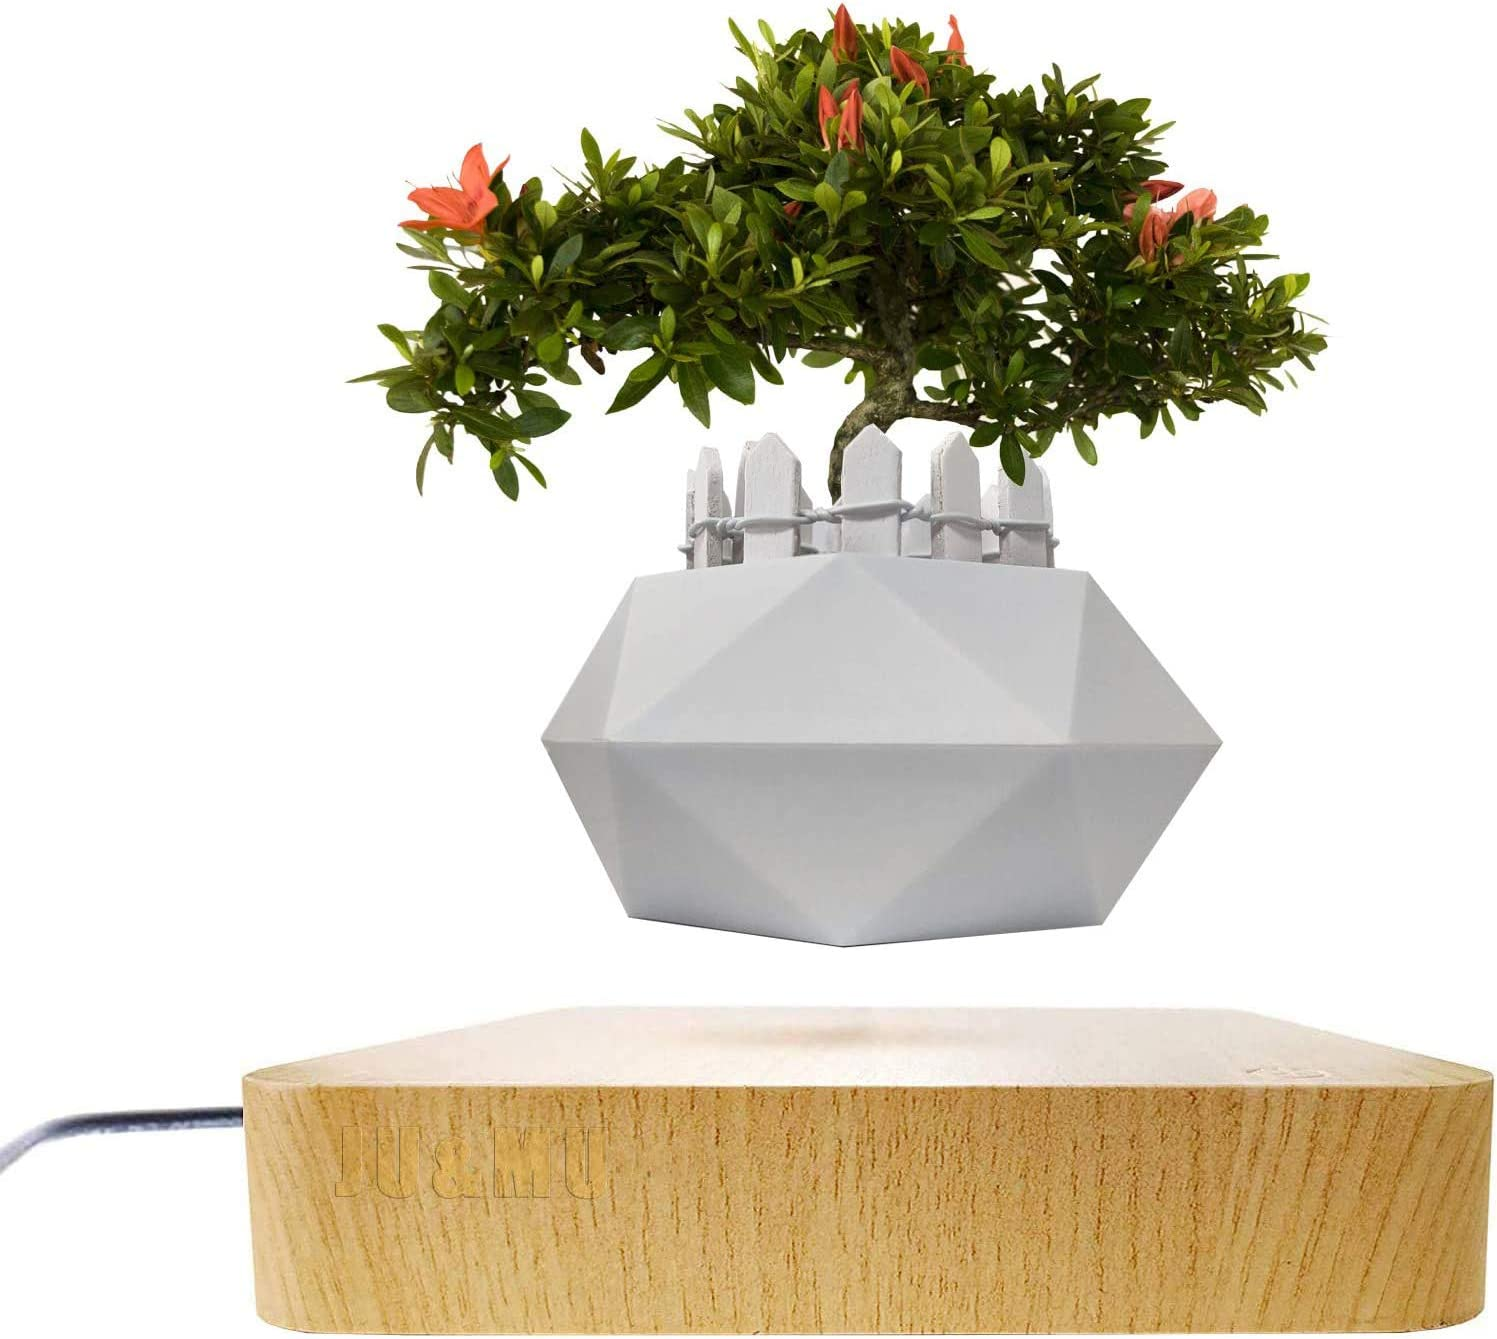 Levitating Air Bonsai Rotation Flower  Magnetic Suspension Floating Pot Plant